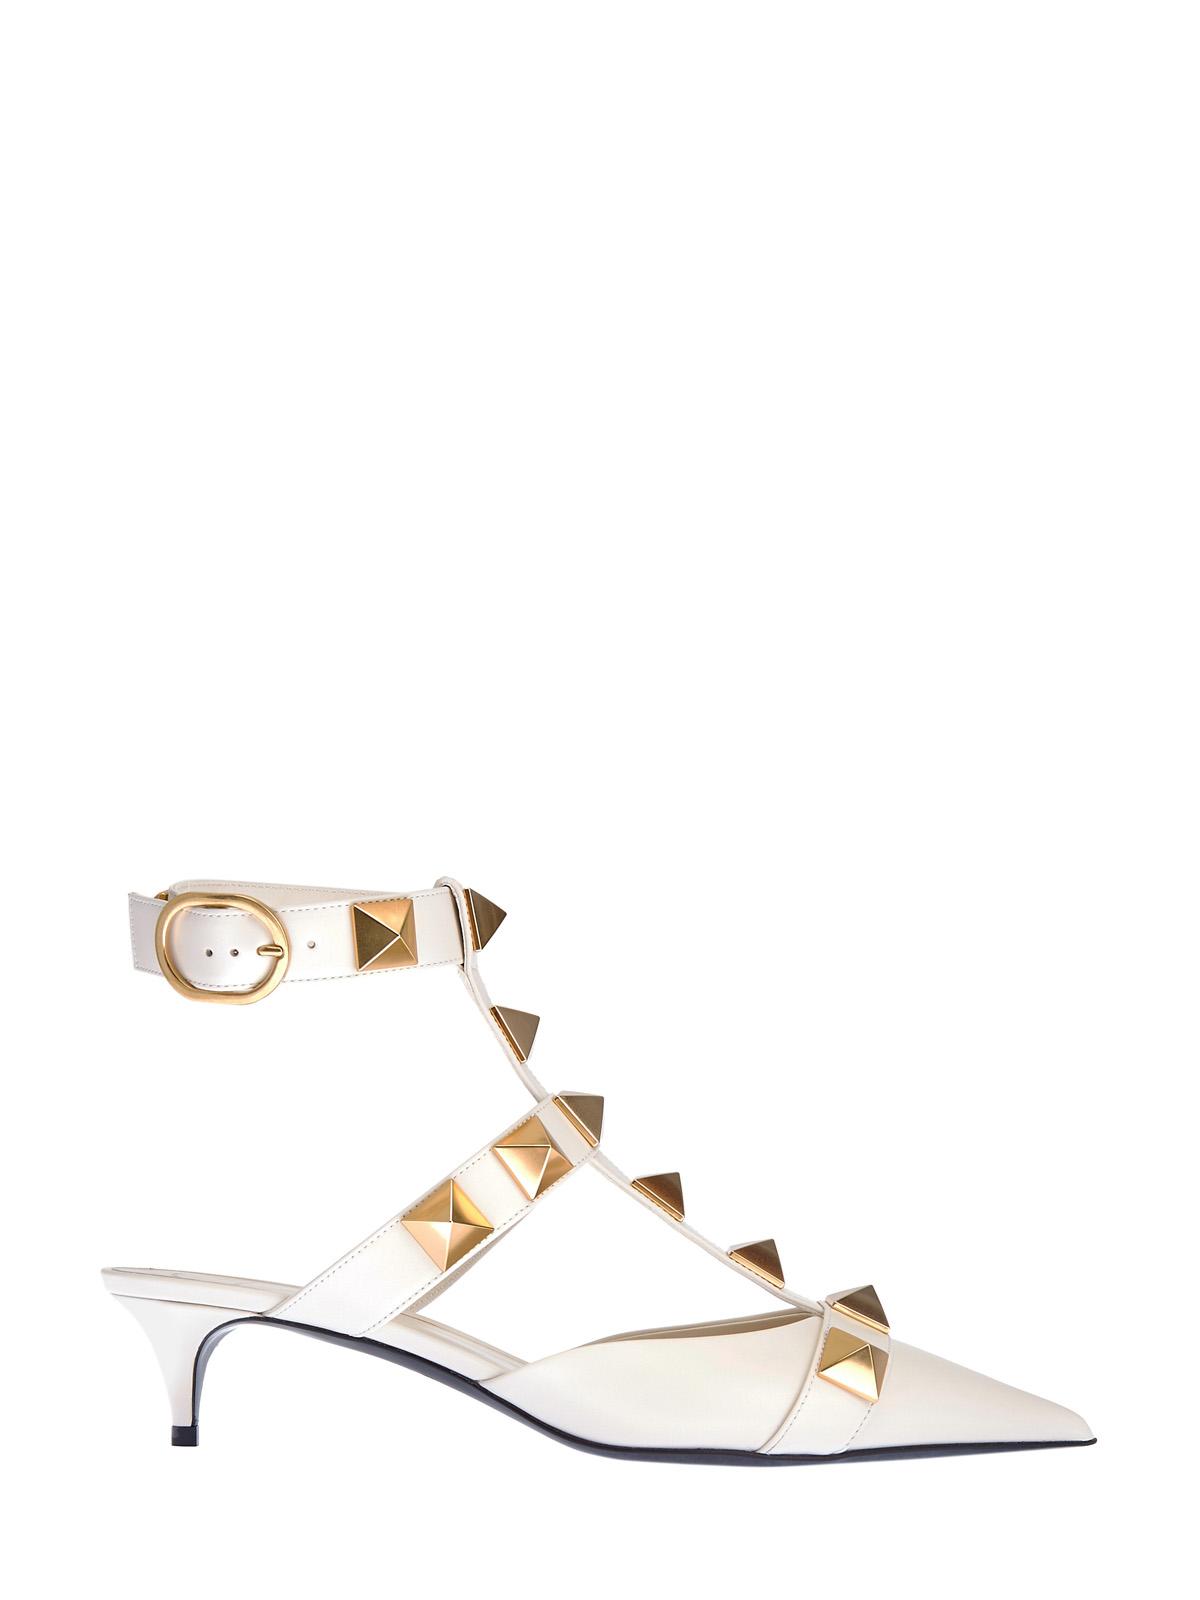 Кожаные туфли Roman Stud с каблуком kitten-heel